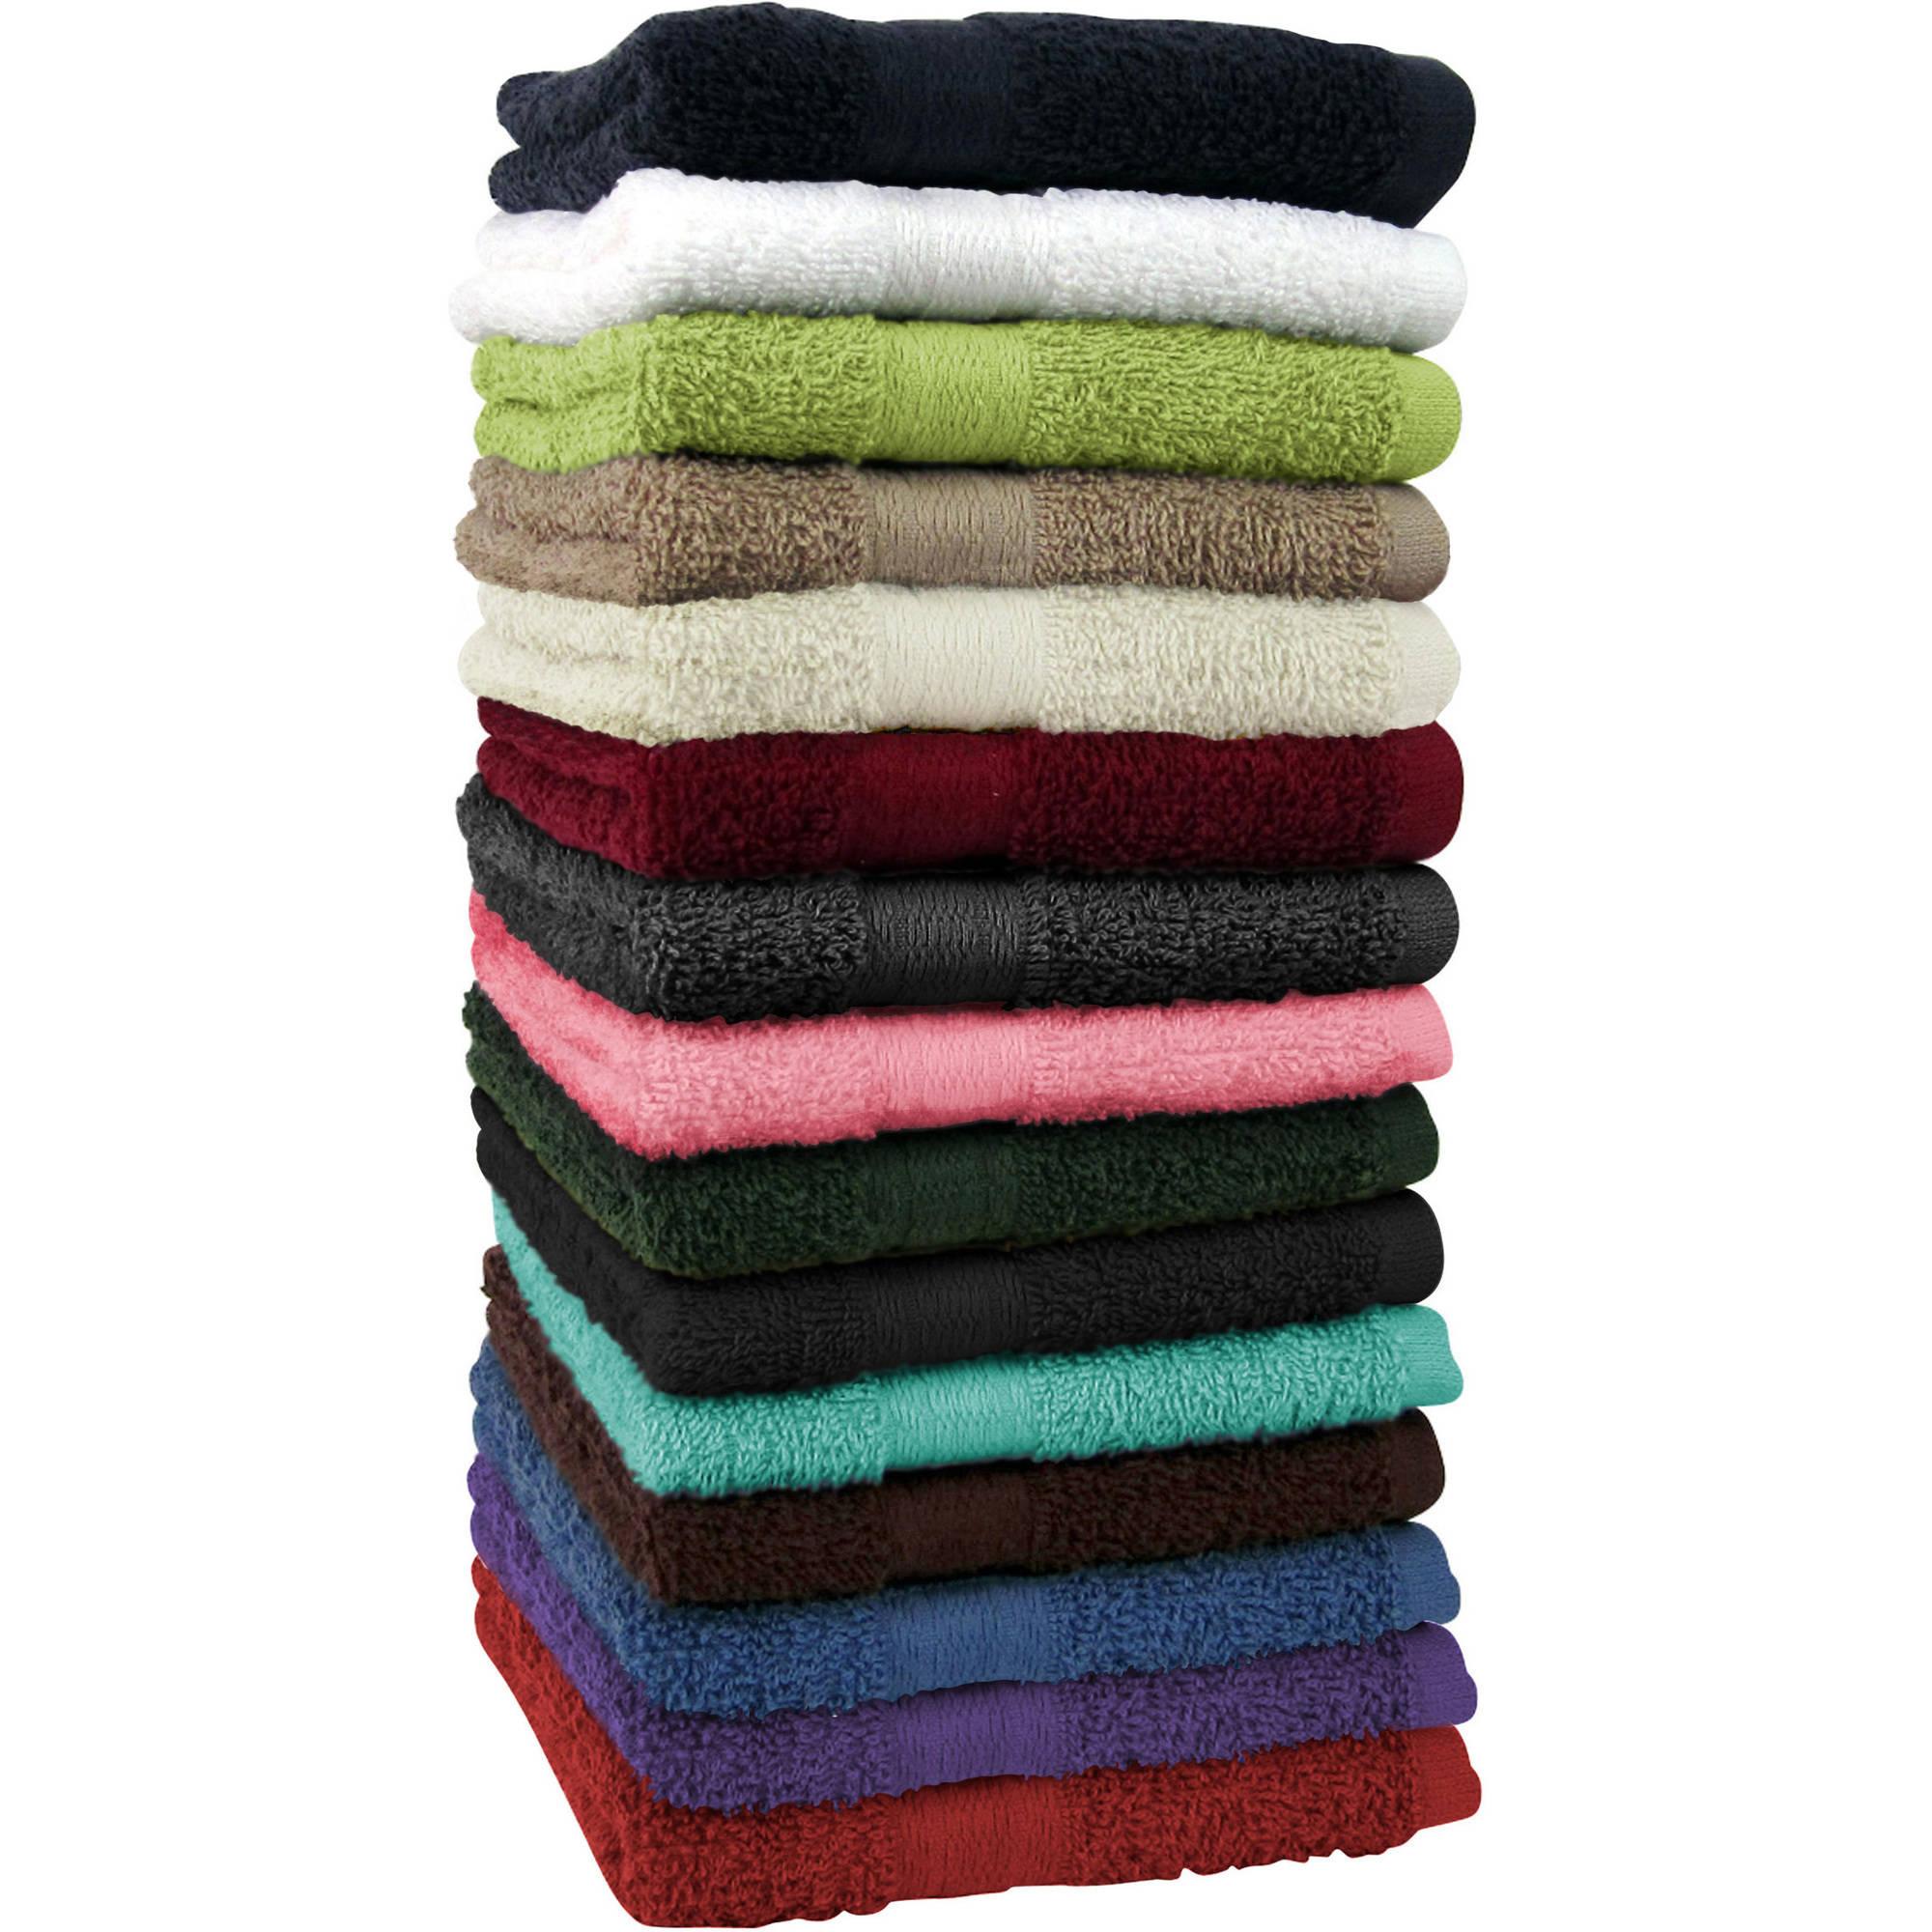 bath towels. Mainstays Basic Bath Towel Collection Towels